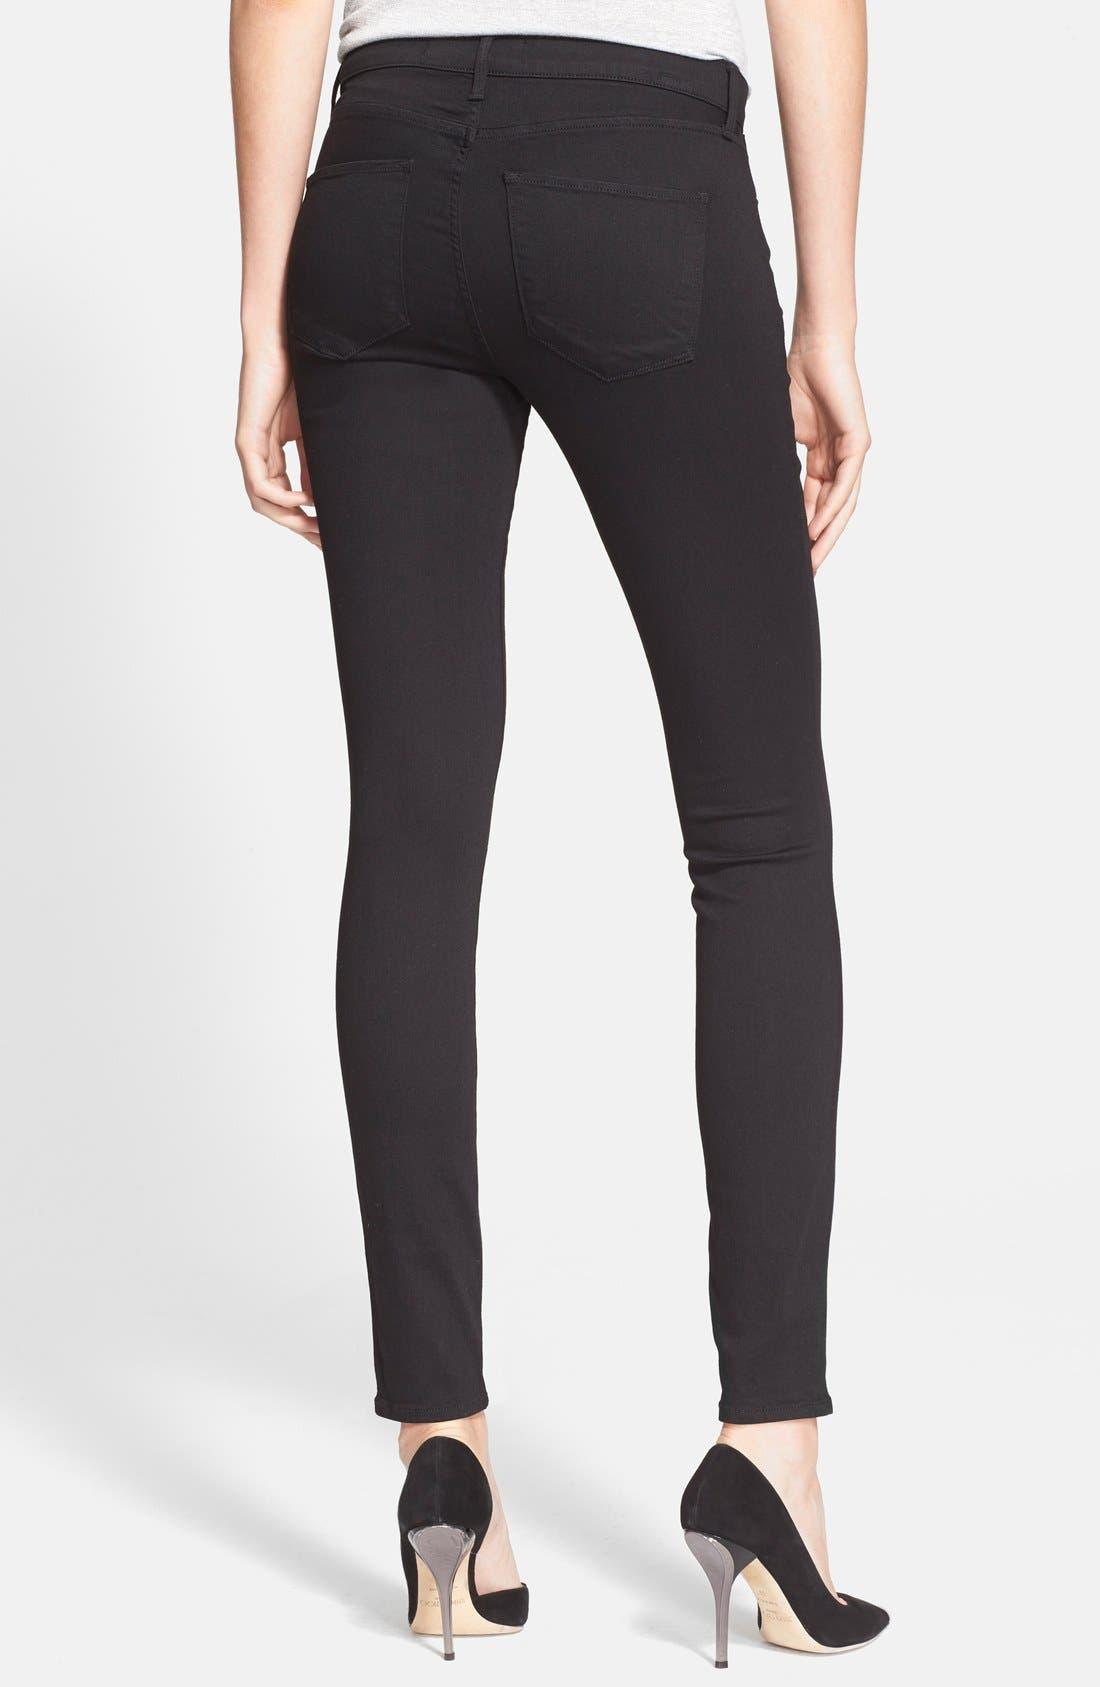 Alternate Image 2  - AYR 'The Skinny' Skinny Jeans (Jet Black)